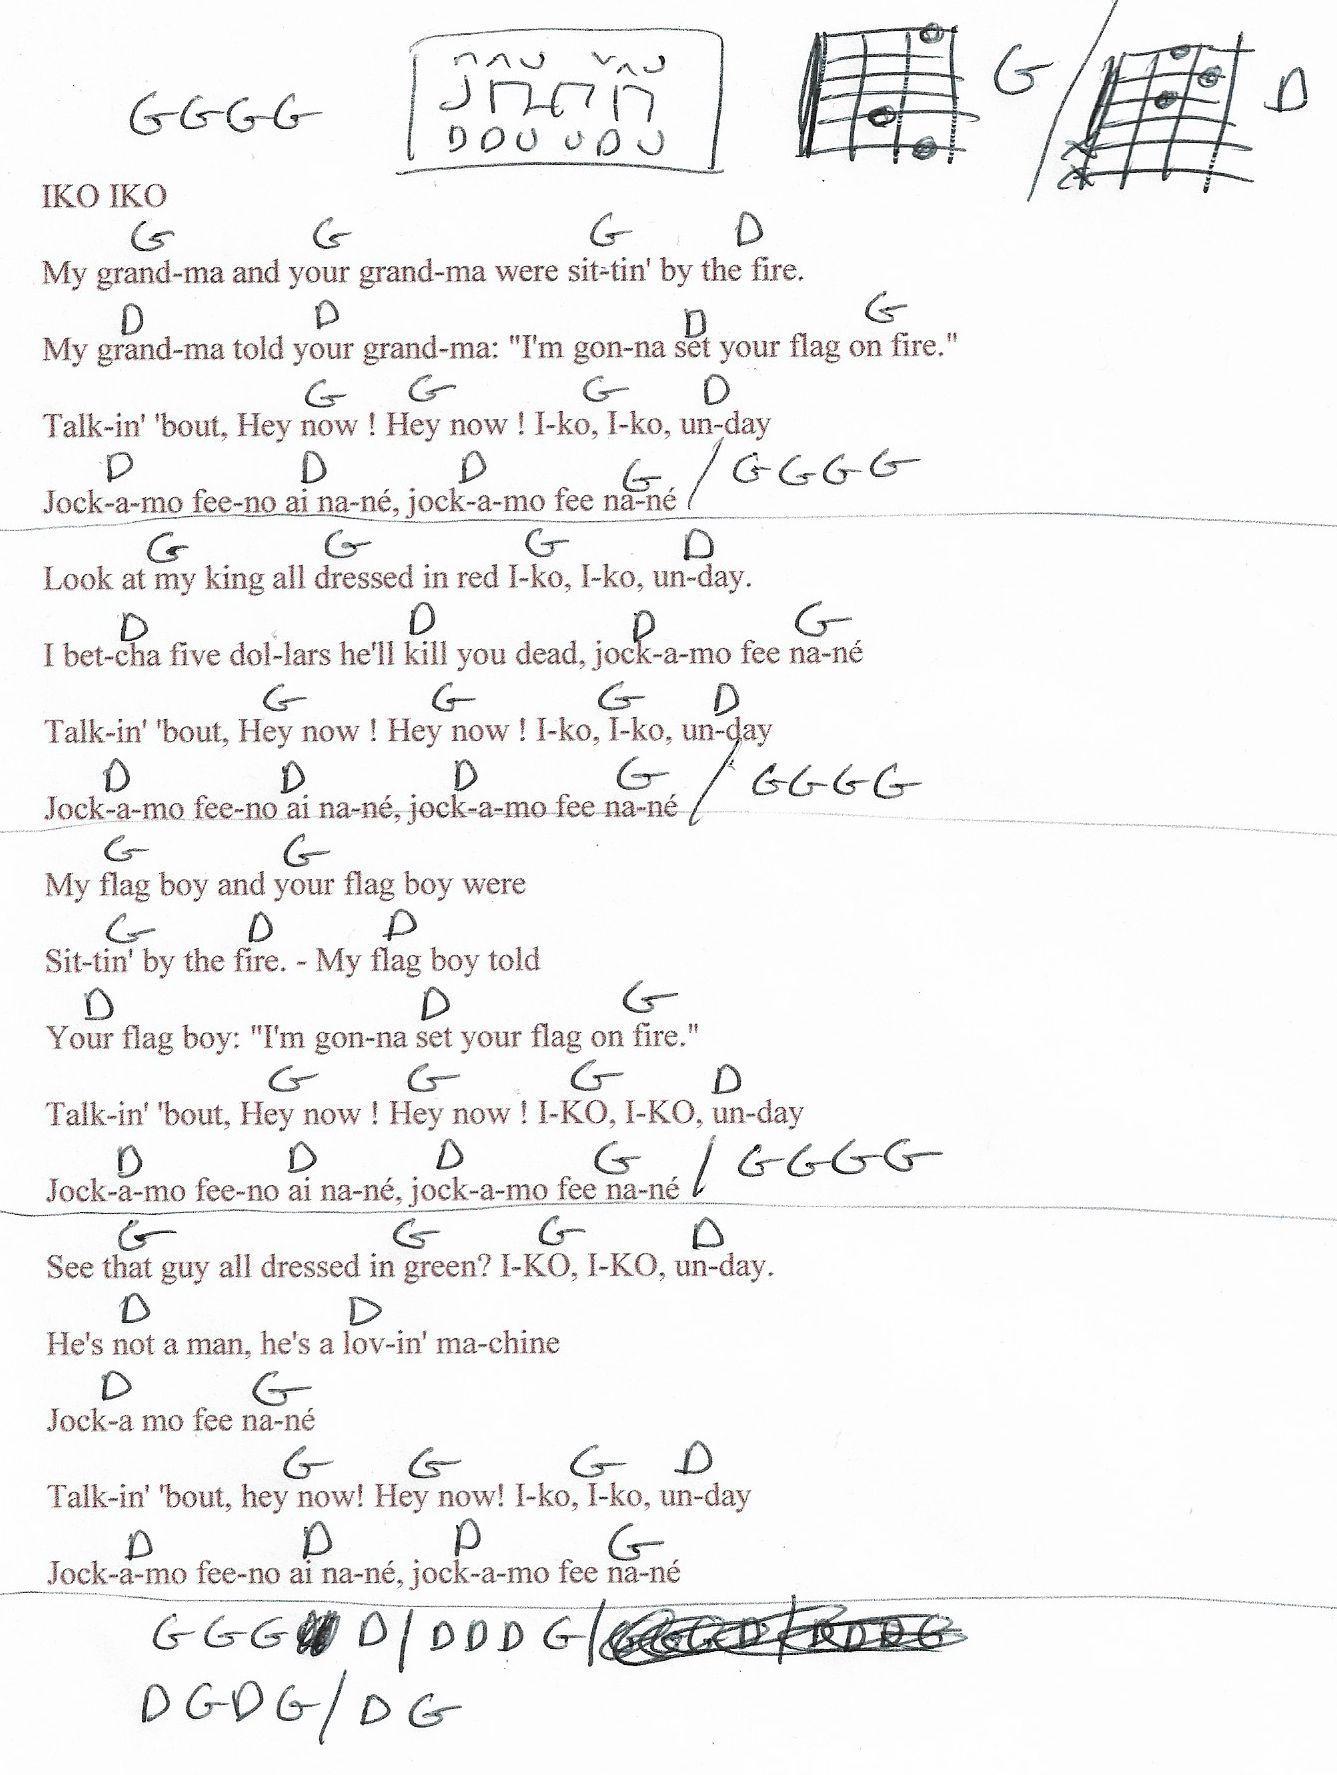 Iko Iko Guitar Chord Chart In G Major Mostly Ukulele Happiness